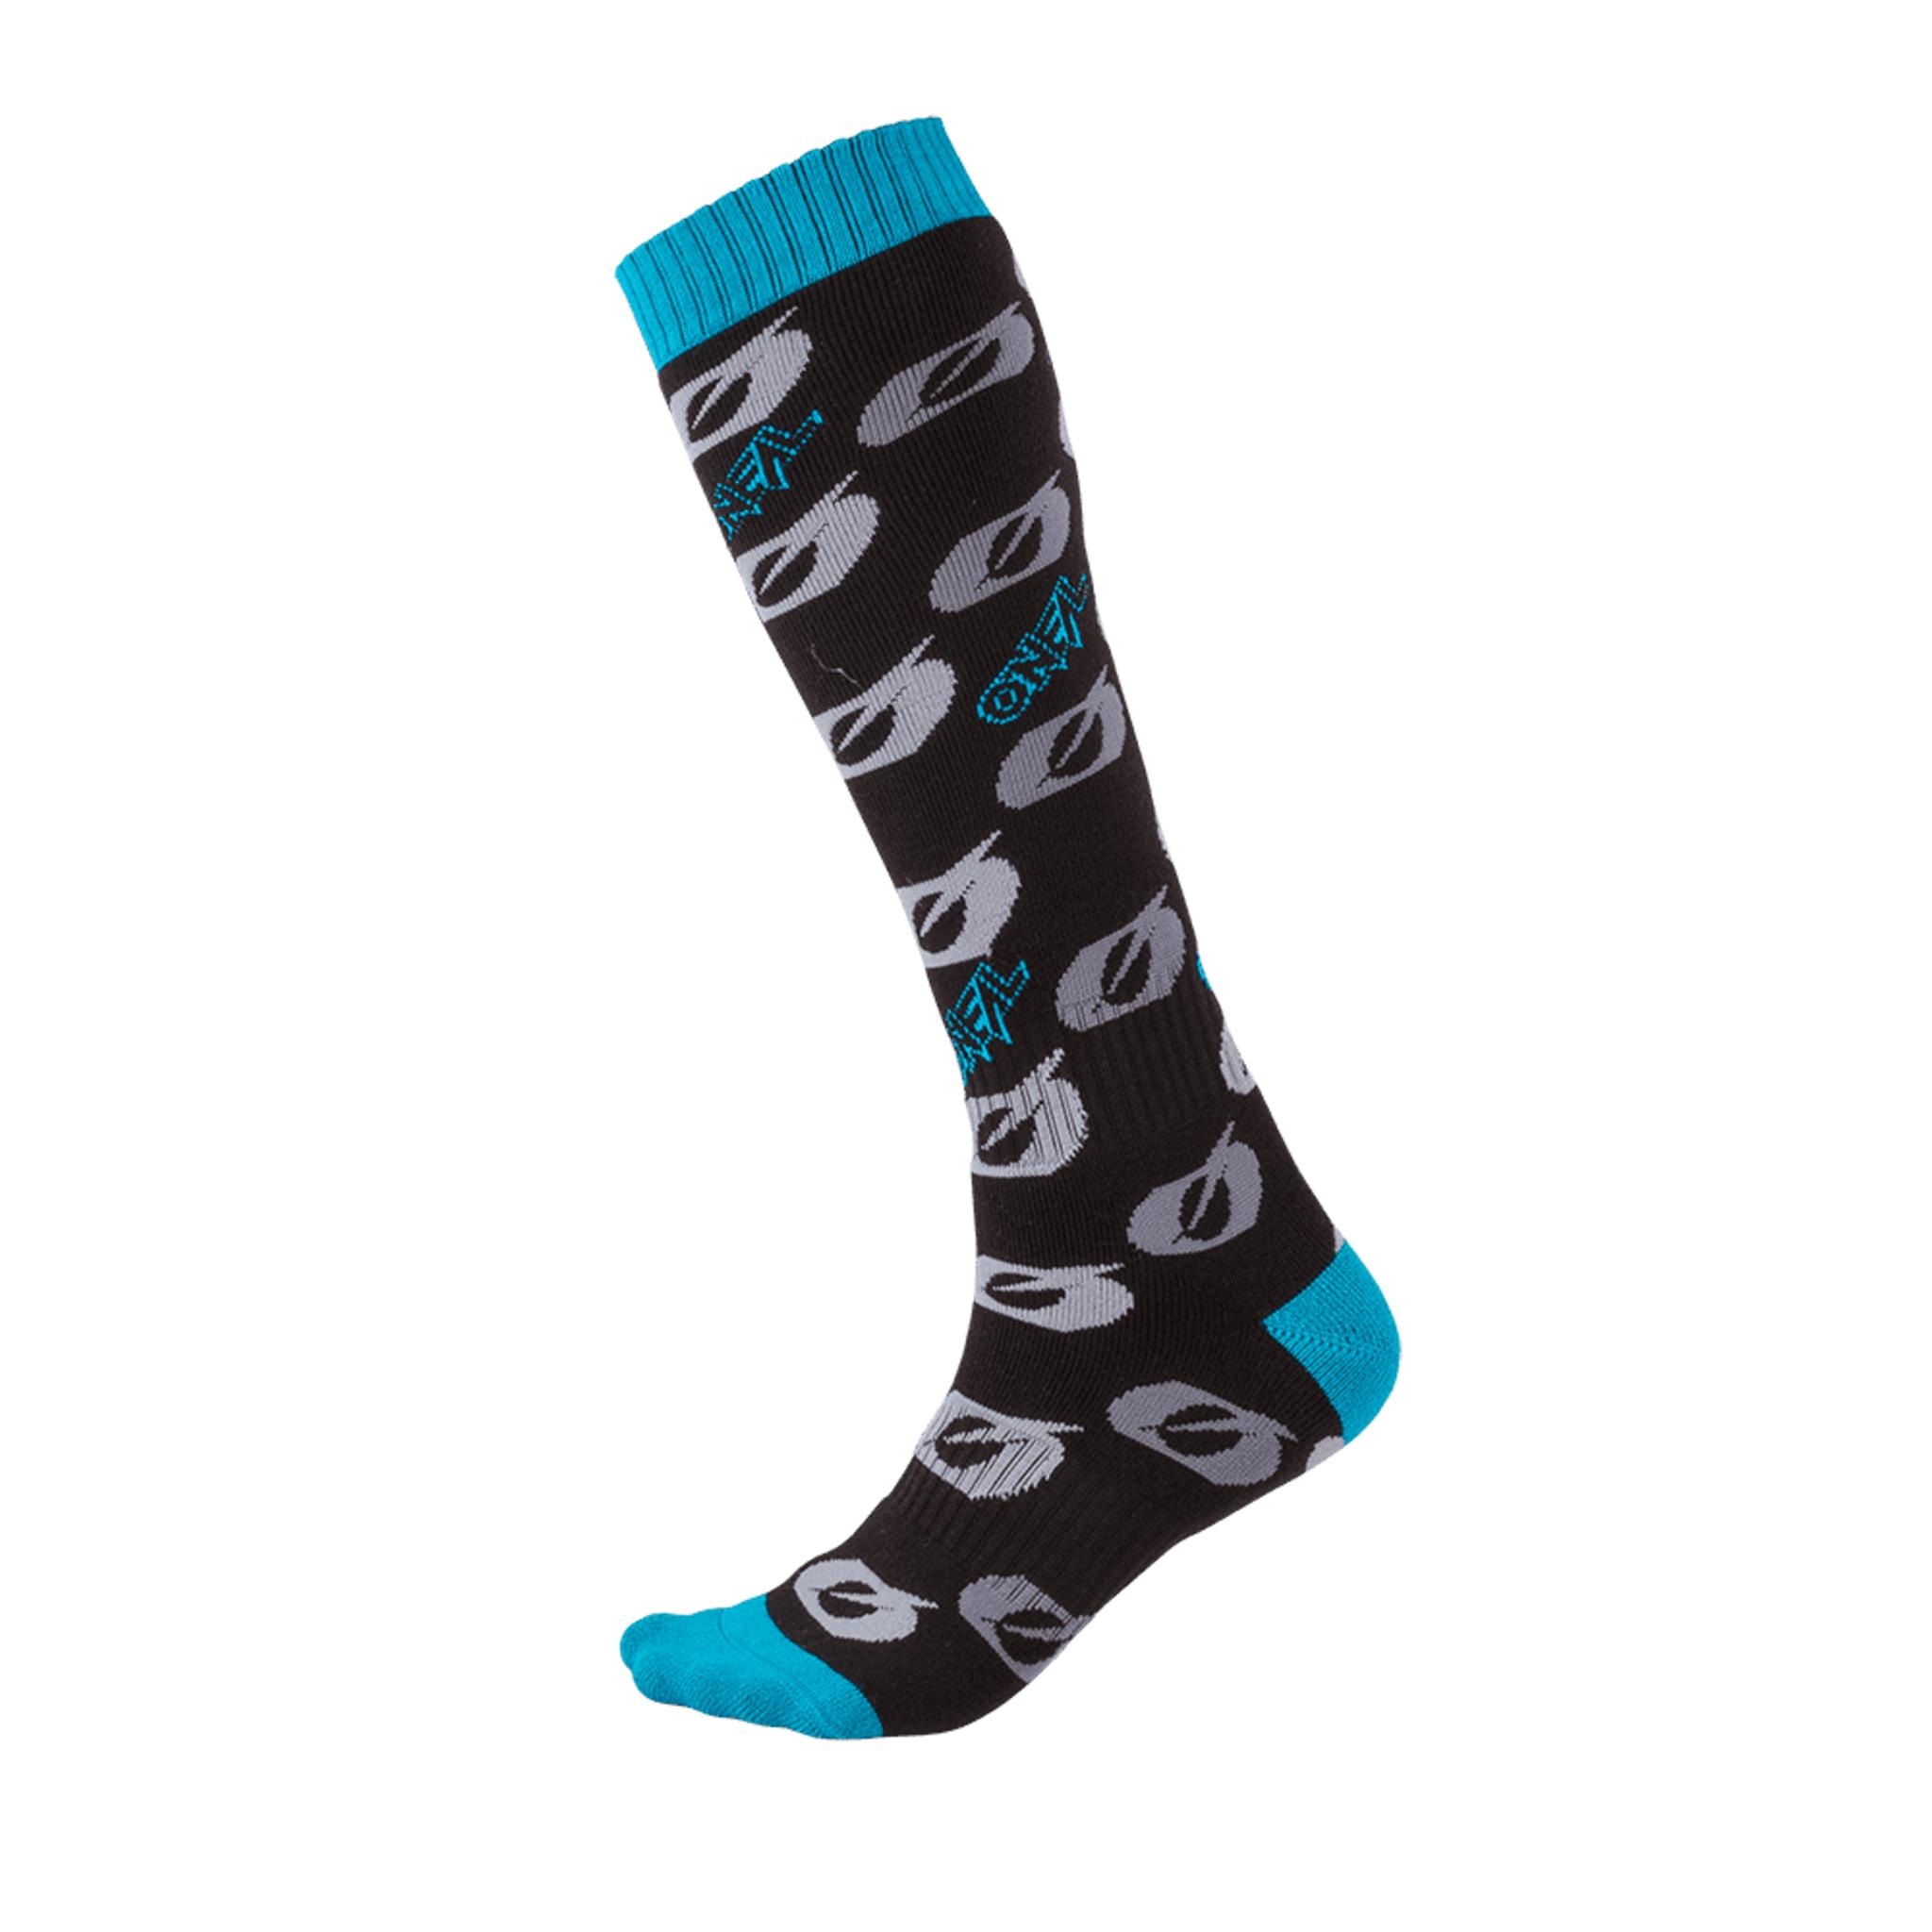 Носки для мотокросса Pro Mx Ologo